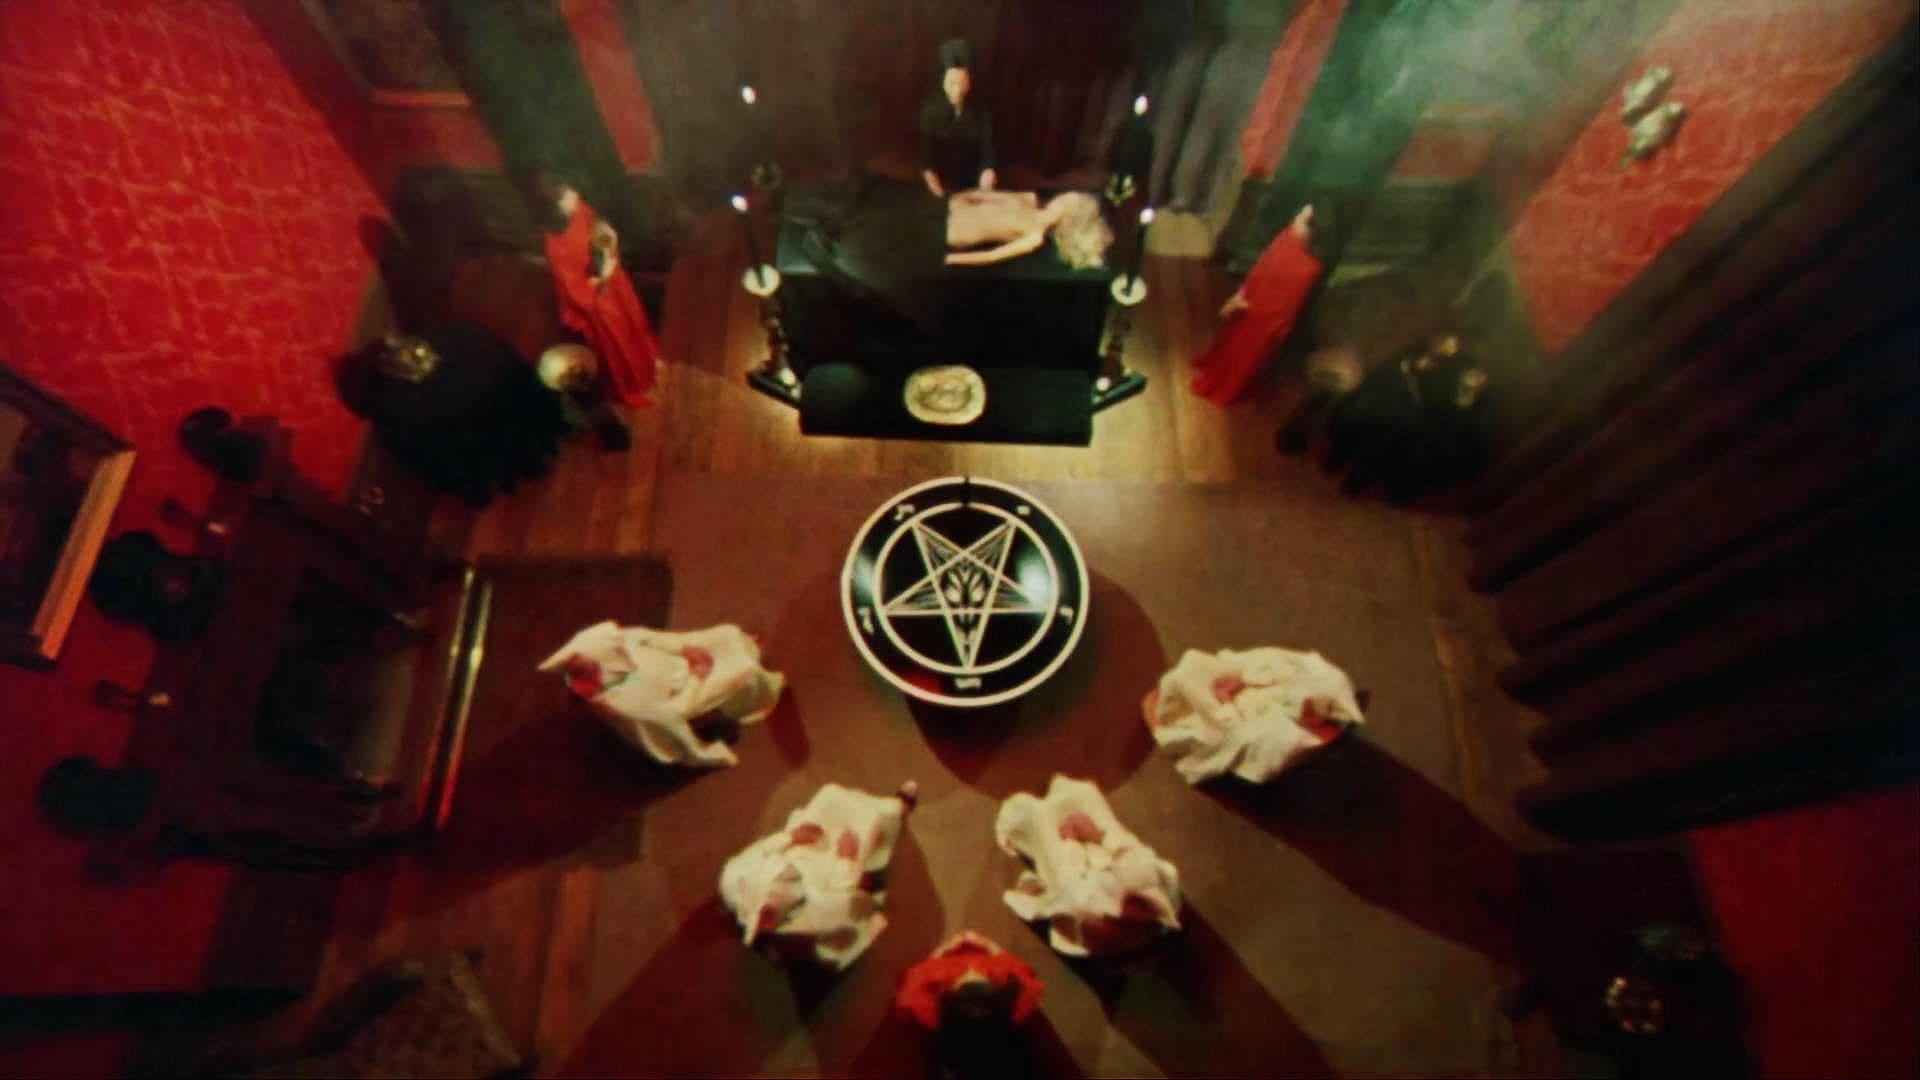 The Satanic Rites of Dracula backdrop